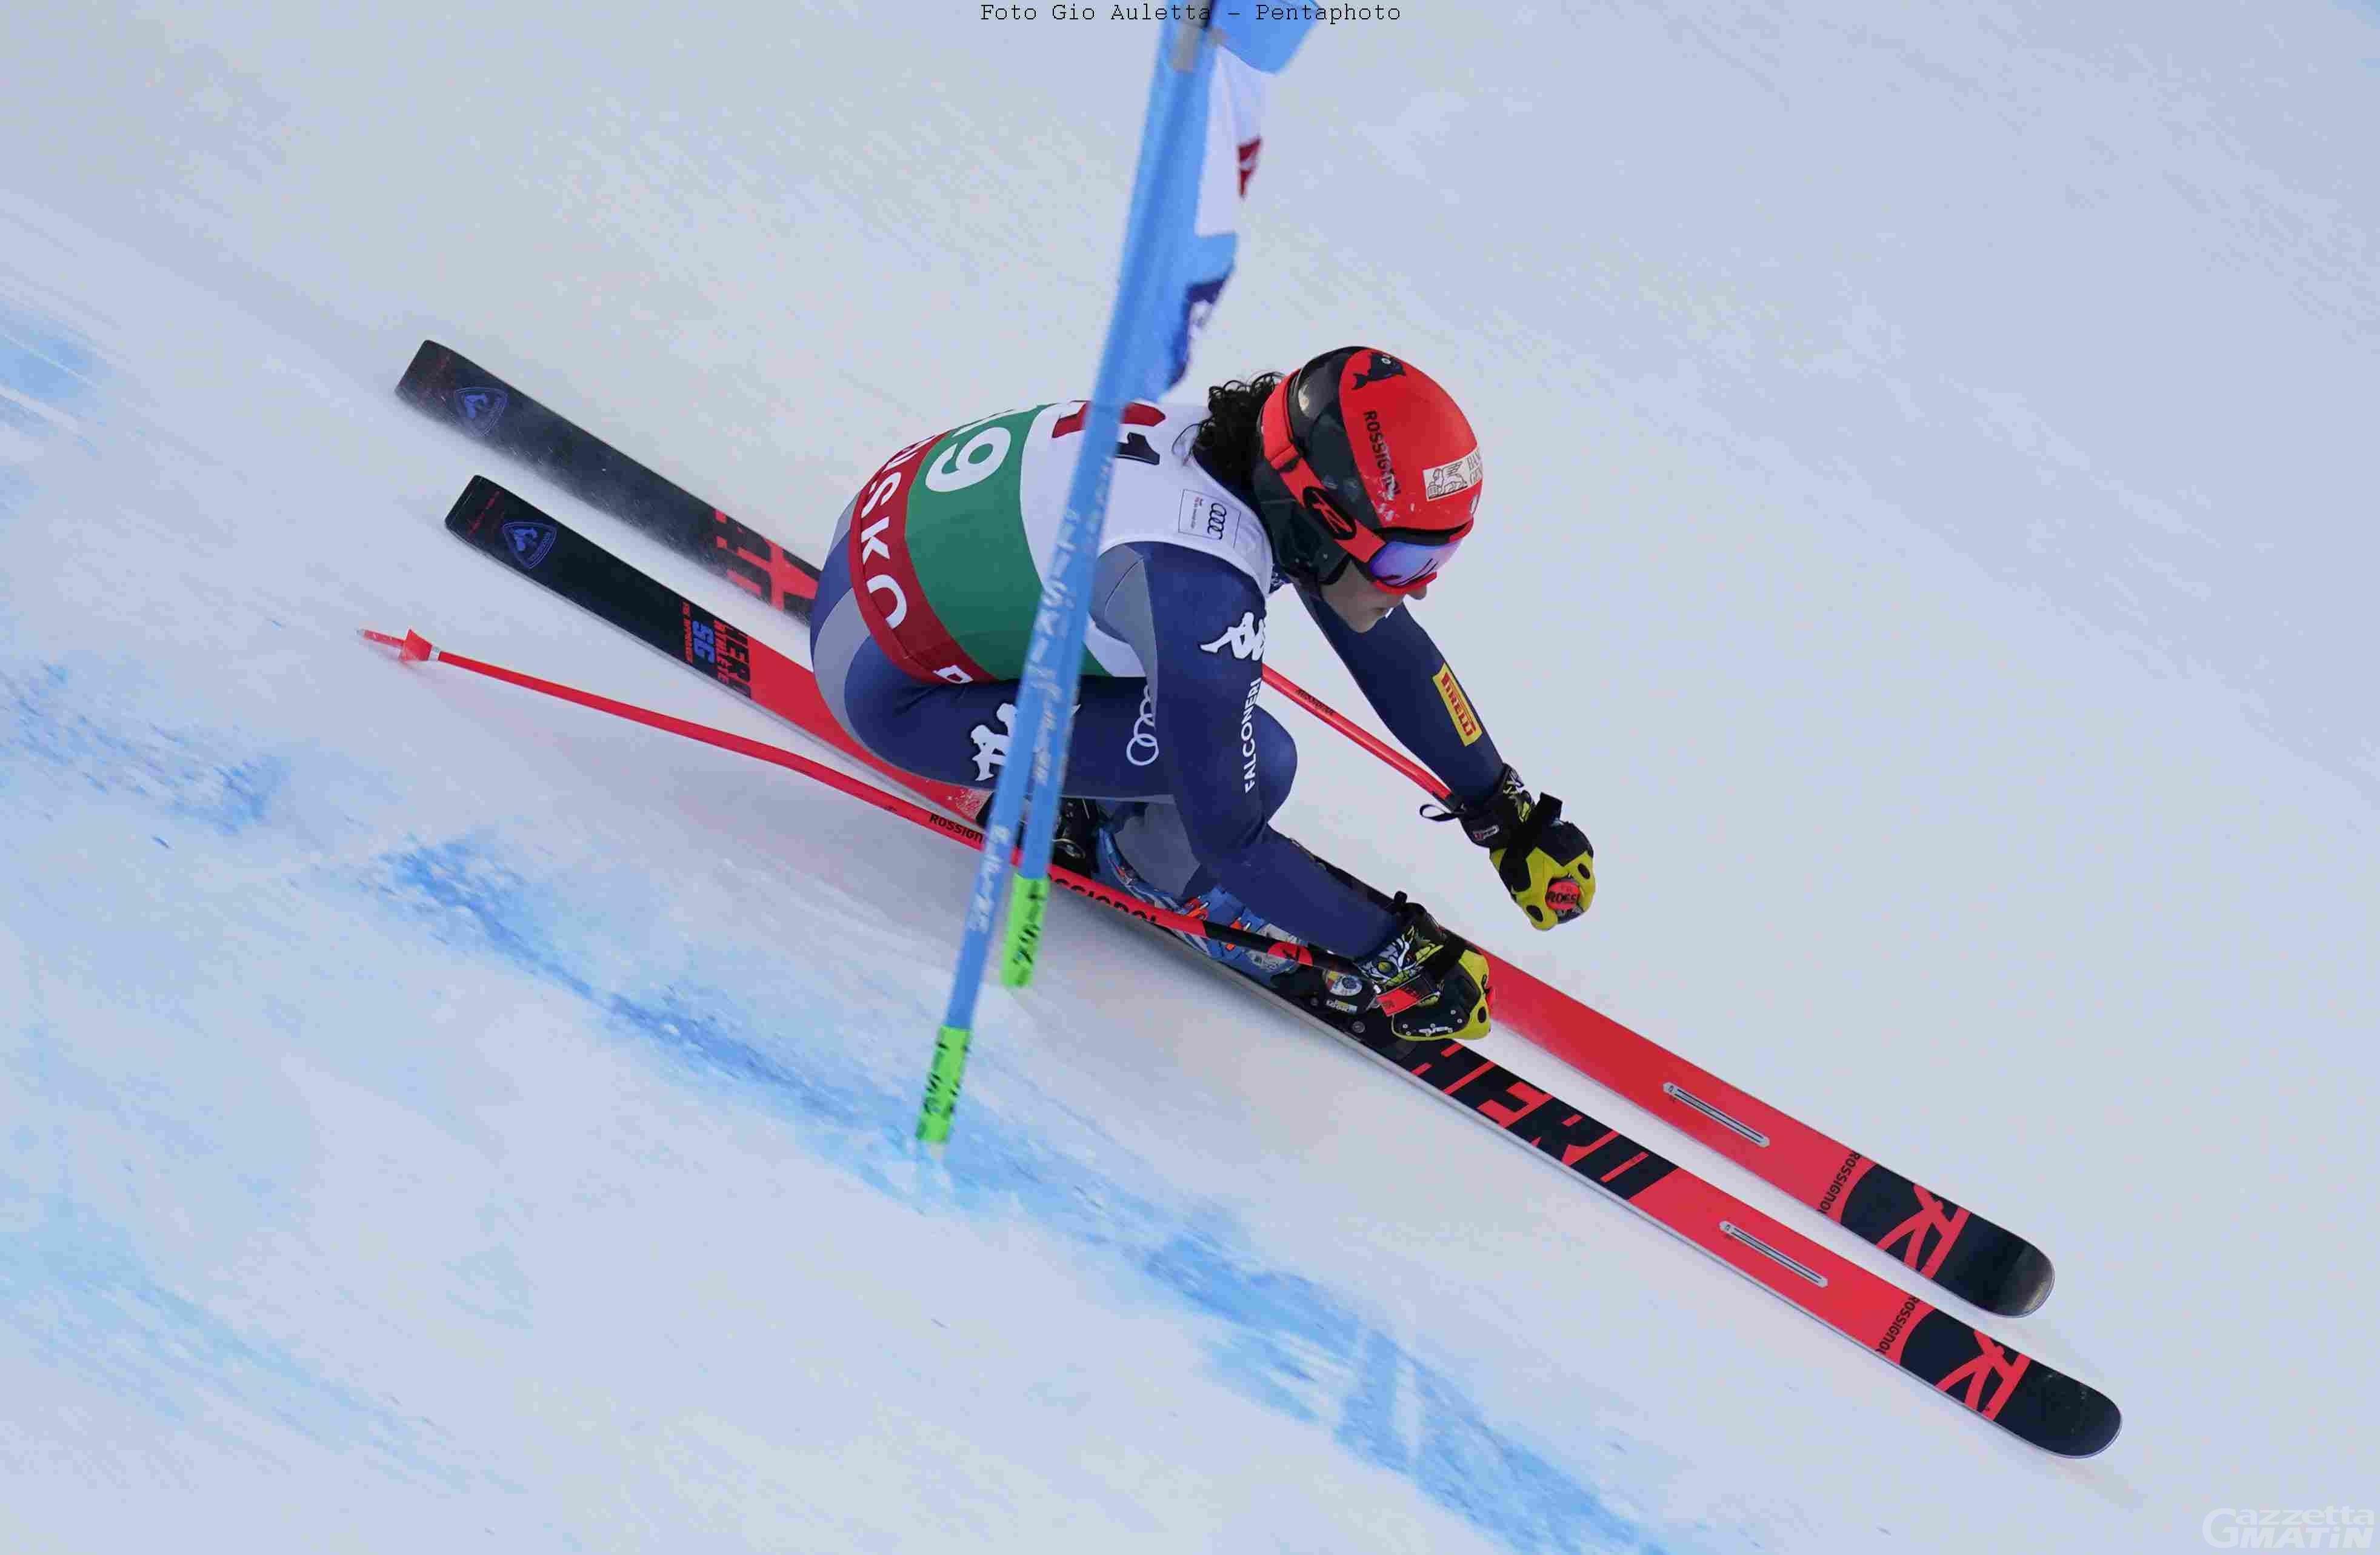 Sci alpino: Federica Brignone sfortunata a Bansko